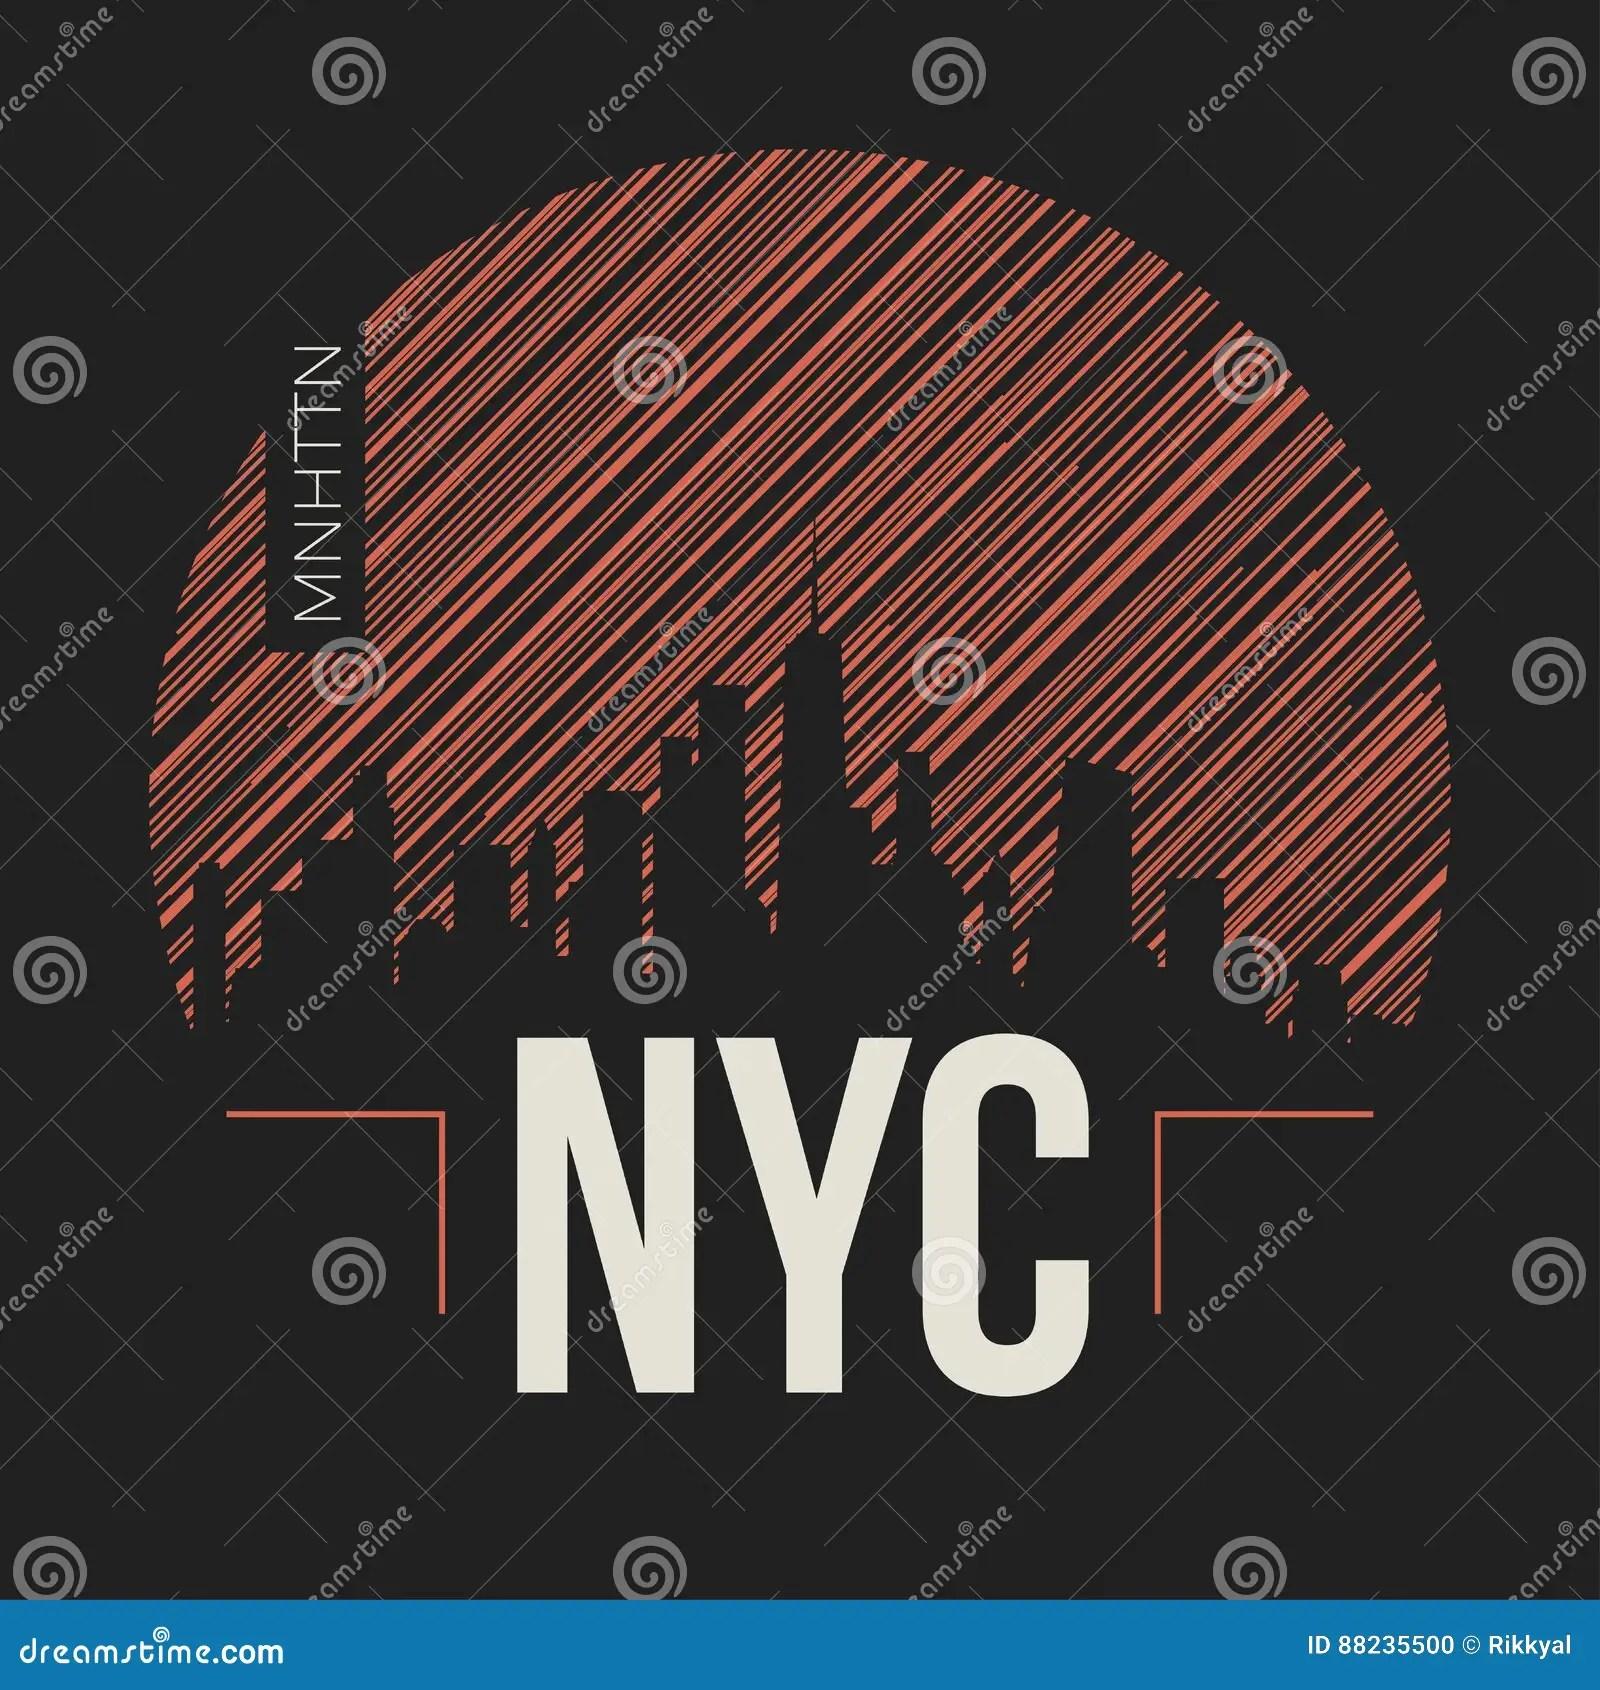 New York City Graphic, T-shirt Design, Tee Print, Typography Stock